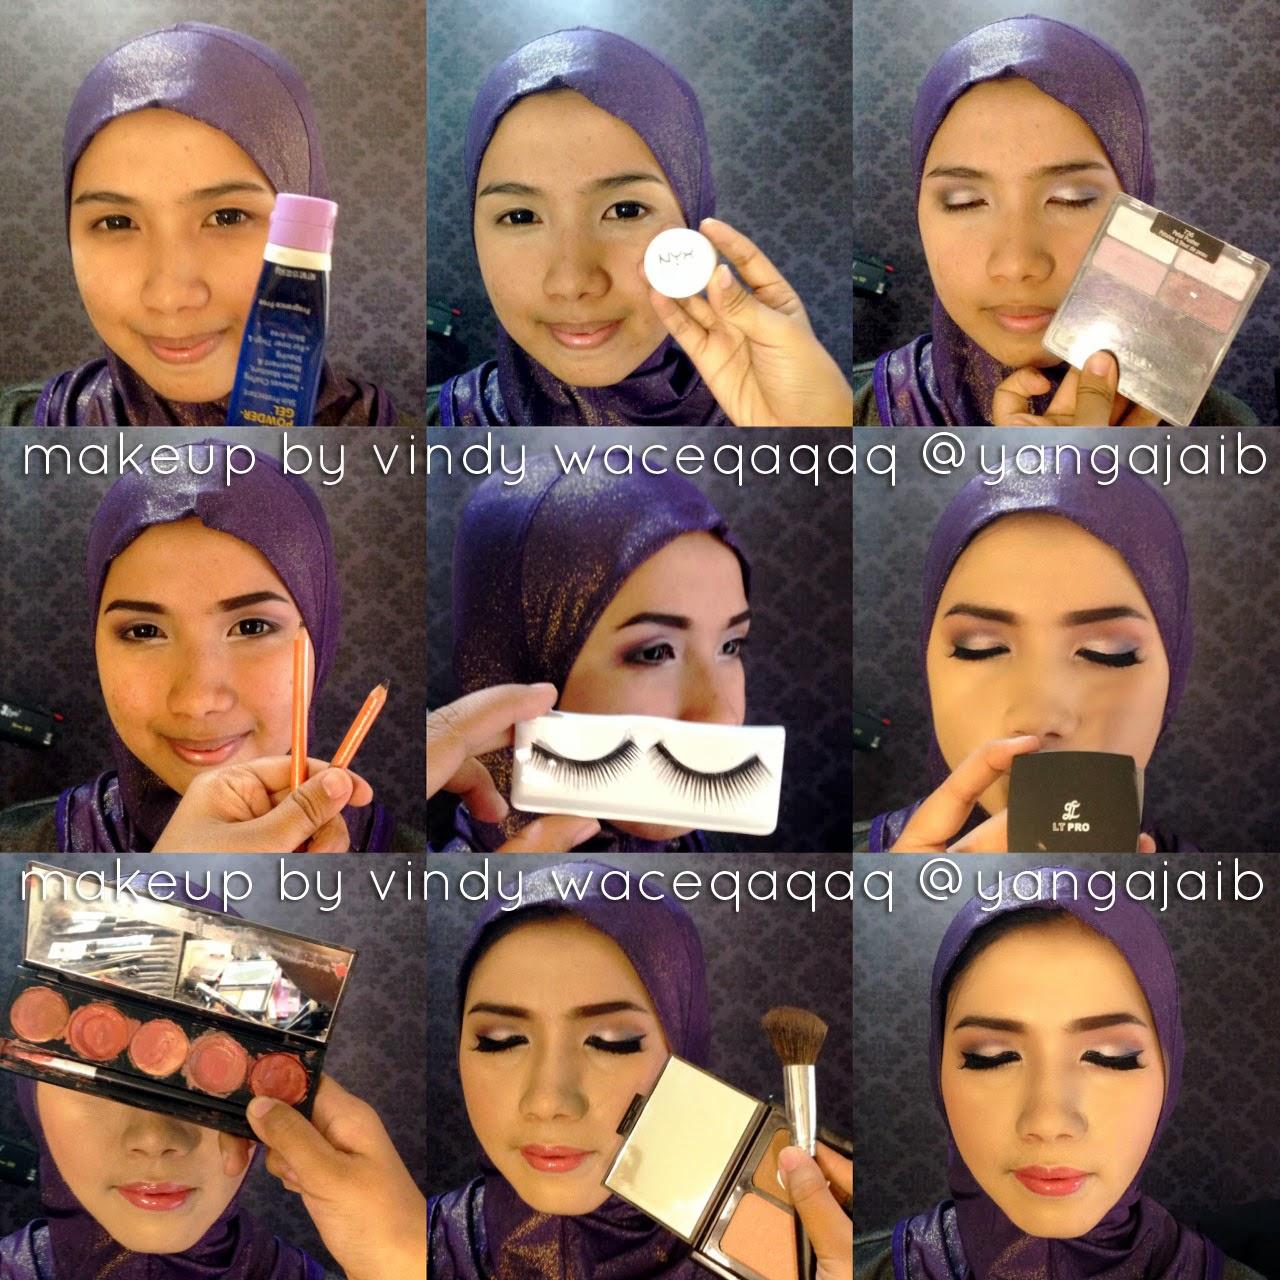 Ini Vindy Yang Ajaib Step By Step Aka Tutorial Hijab Dan Make Up